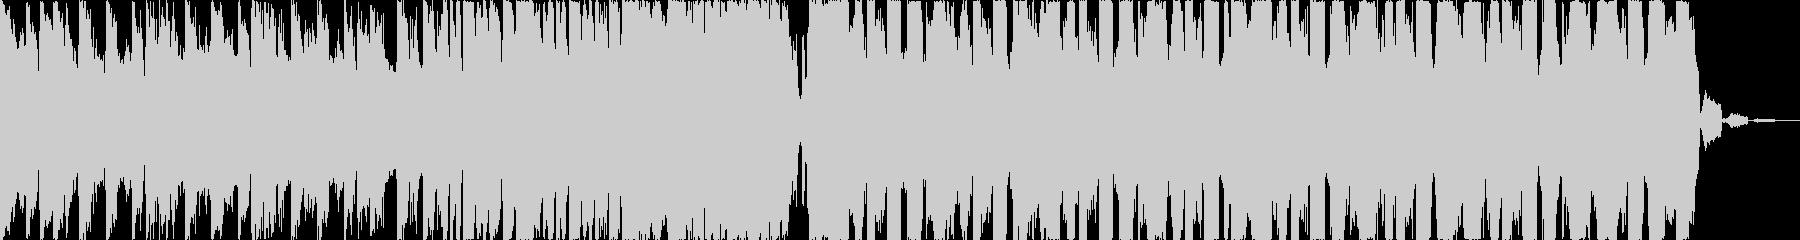 EDMカントリーエレクトロコマーシャルcの未再生の波形